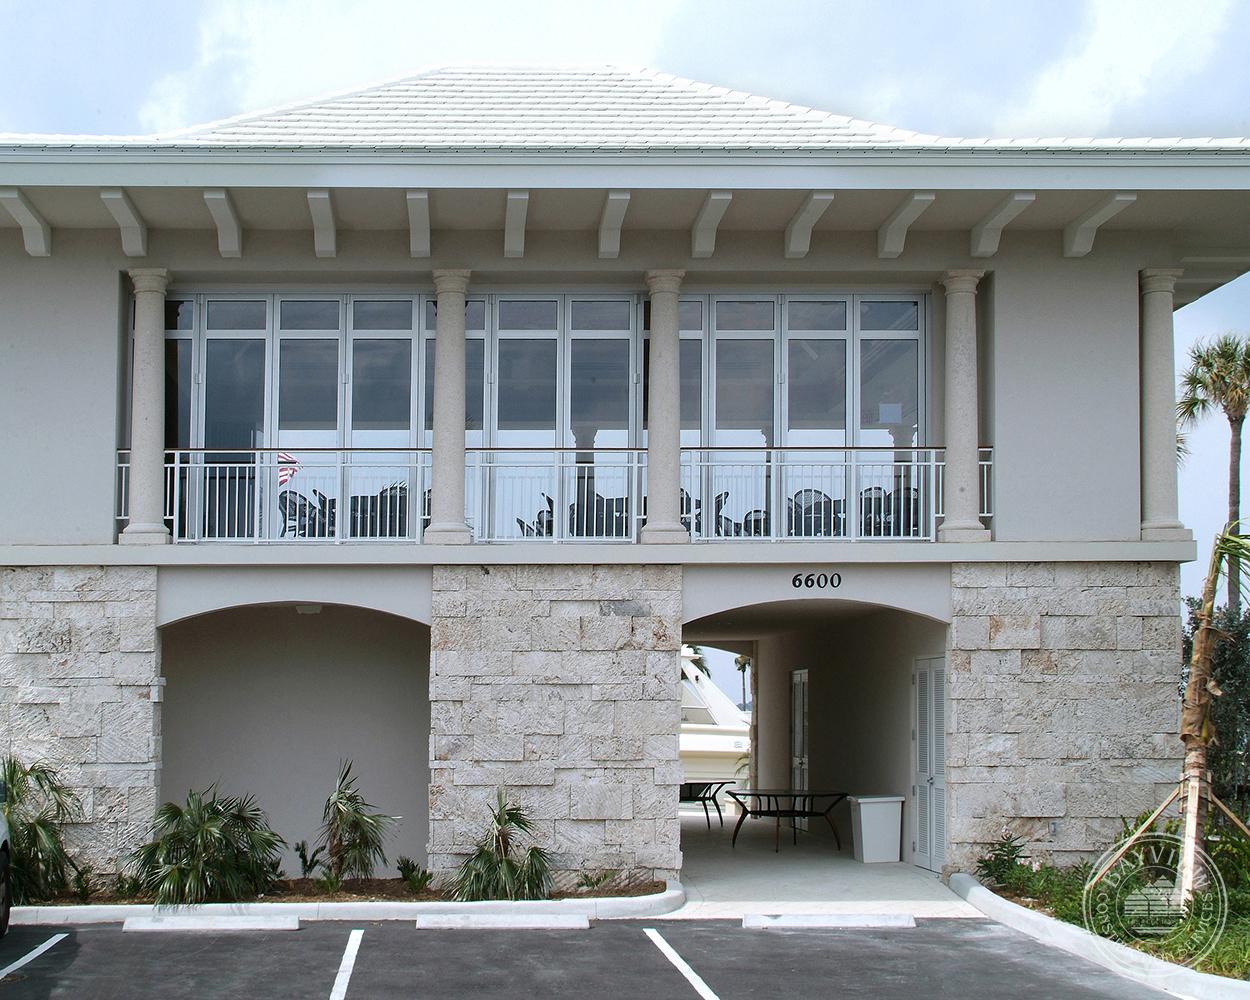 Marina Exterior - Sailfish Point Marina & Yacht Club Hutchinson Island, FL